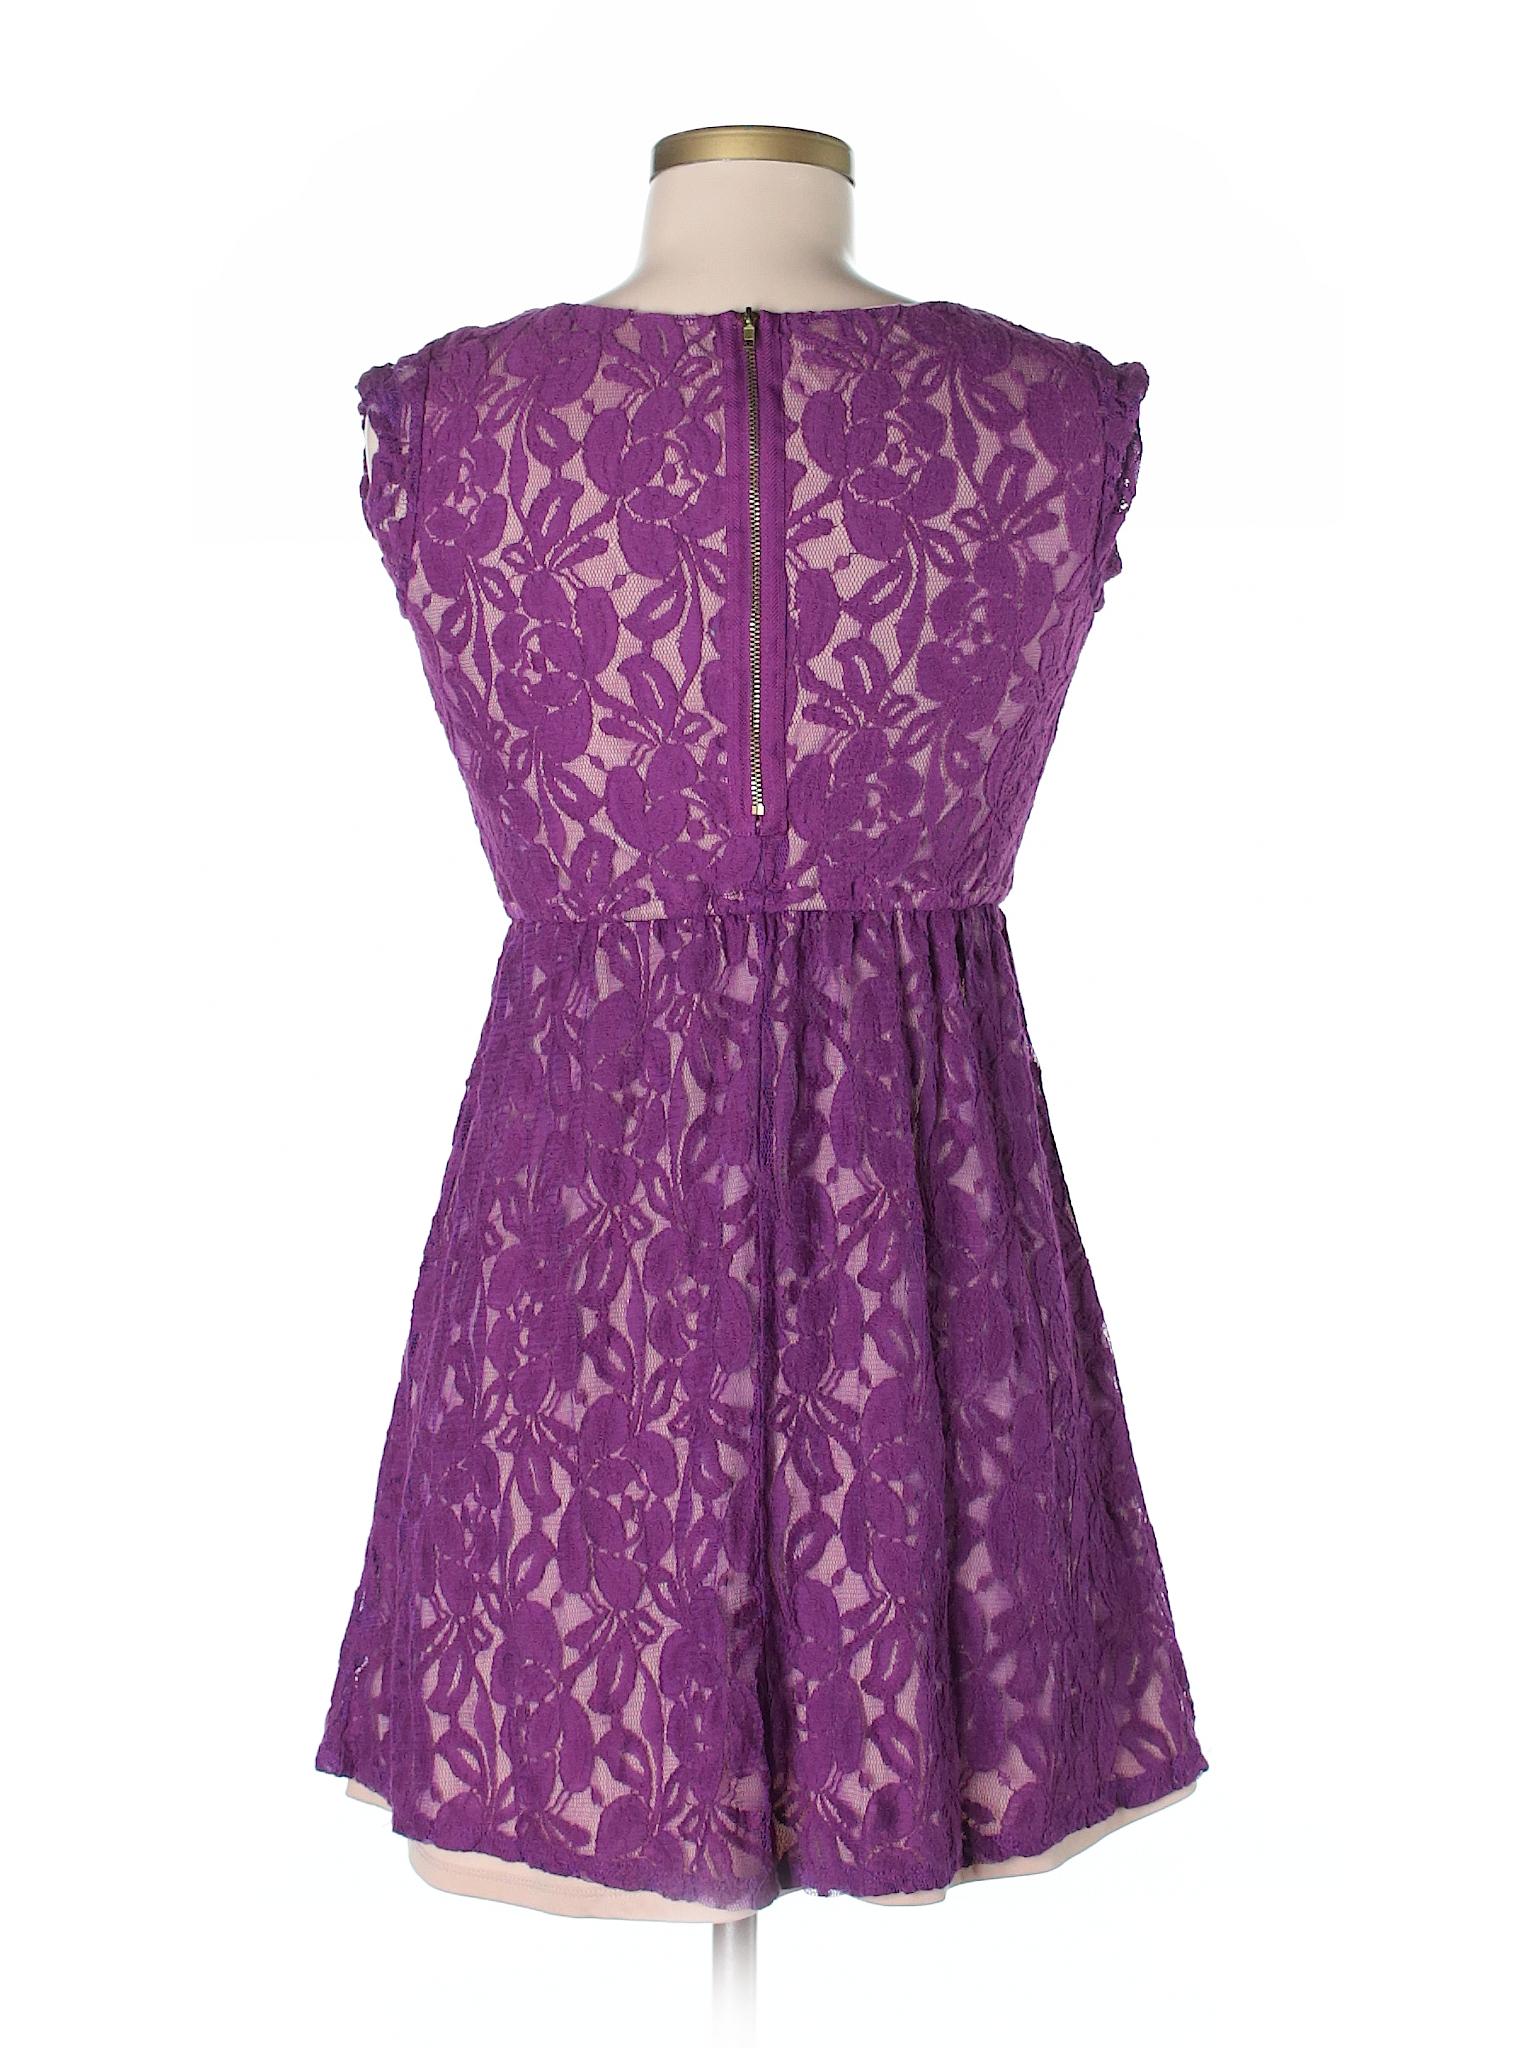 Dress Selling Xhilaration Casual Xhilaration Selling WPqInqdz